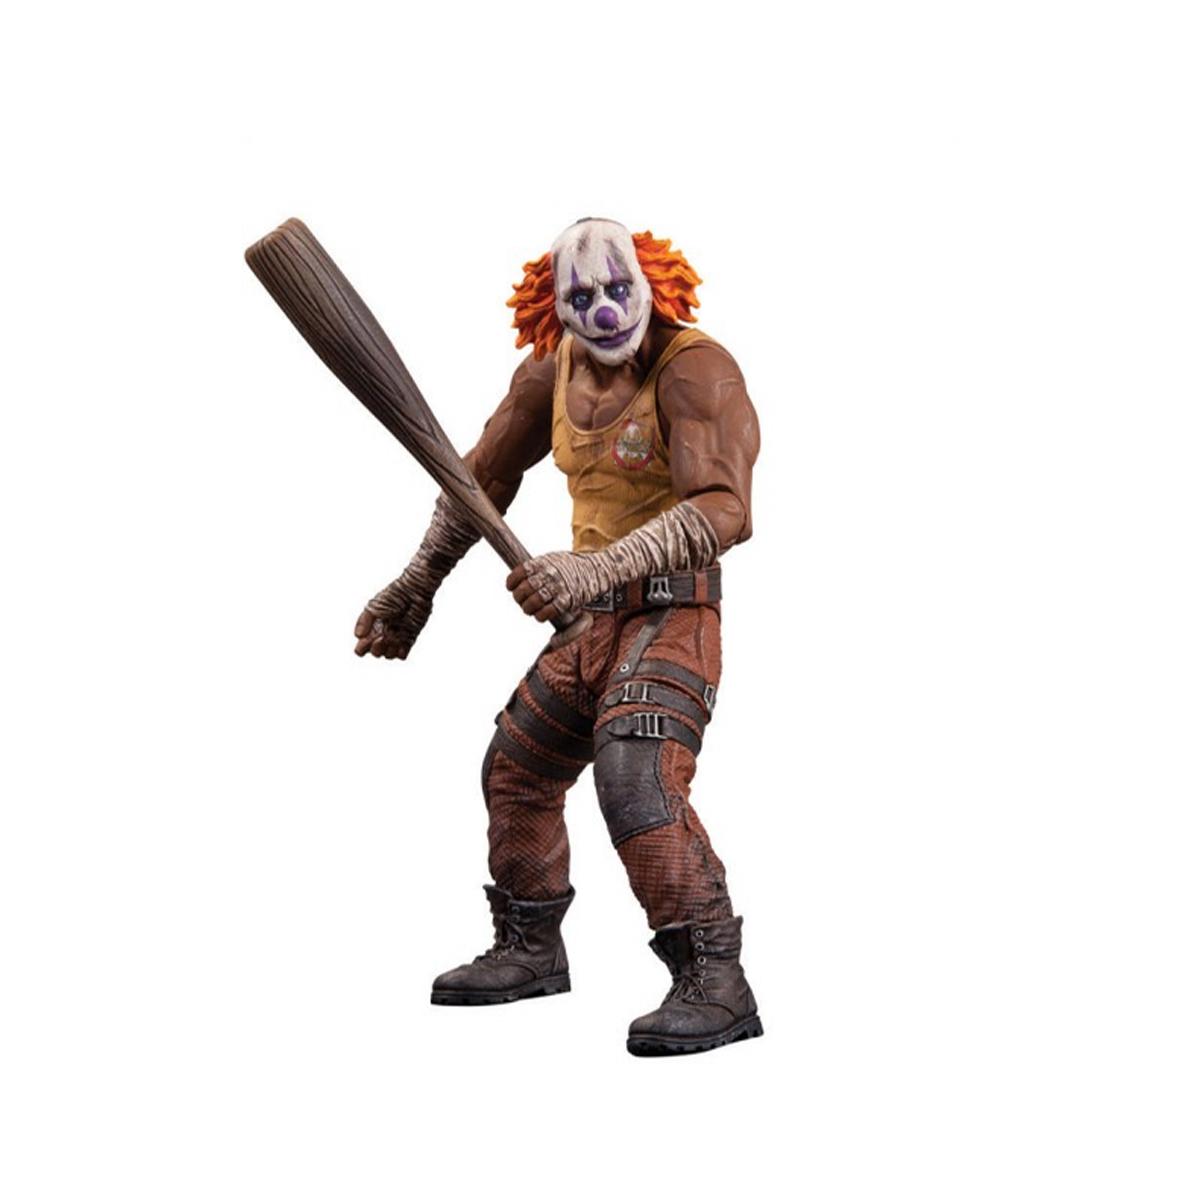 Boneco (Action Figure) Clown Thug 1 Series 3